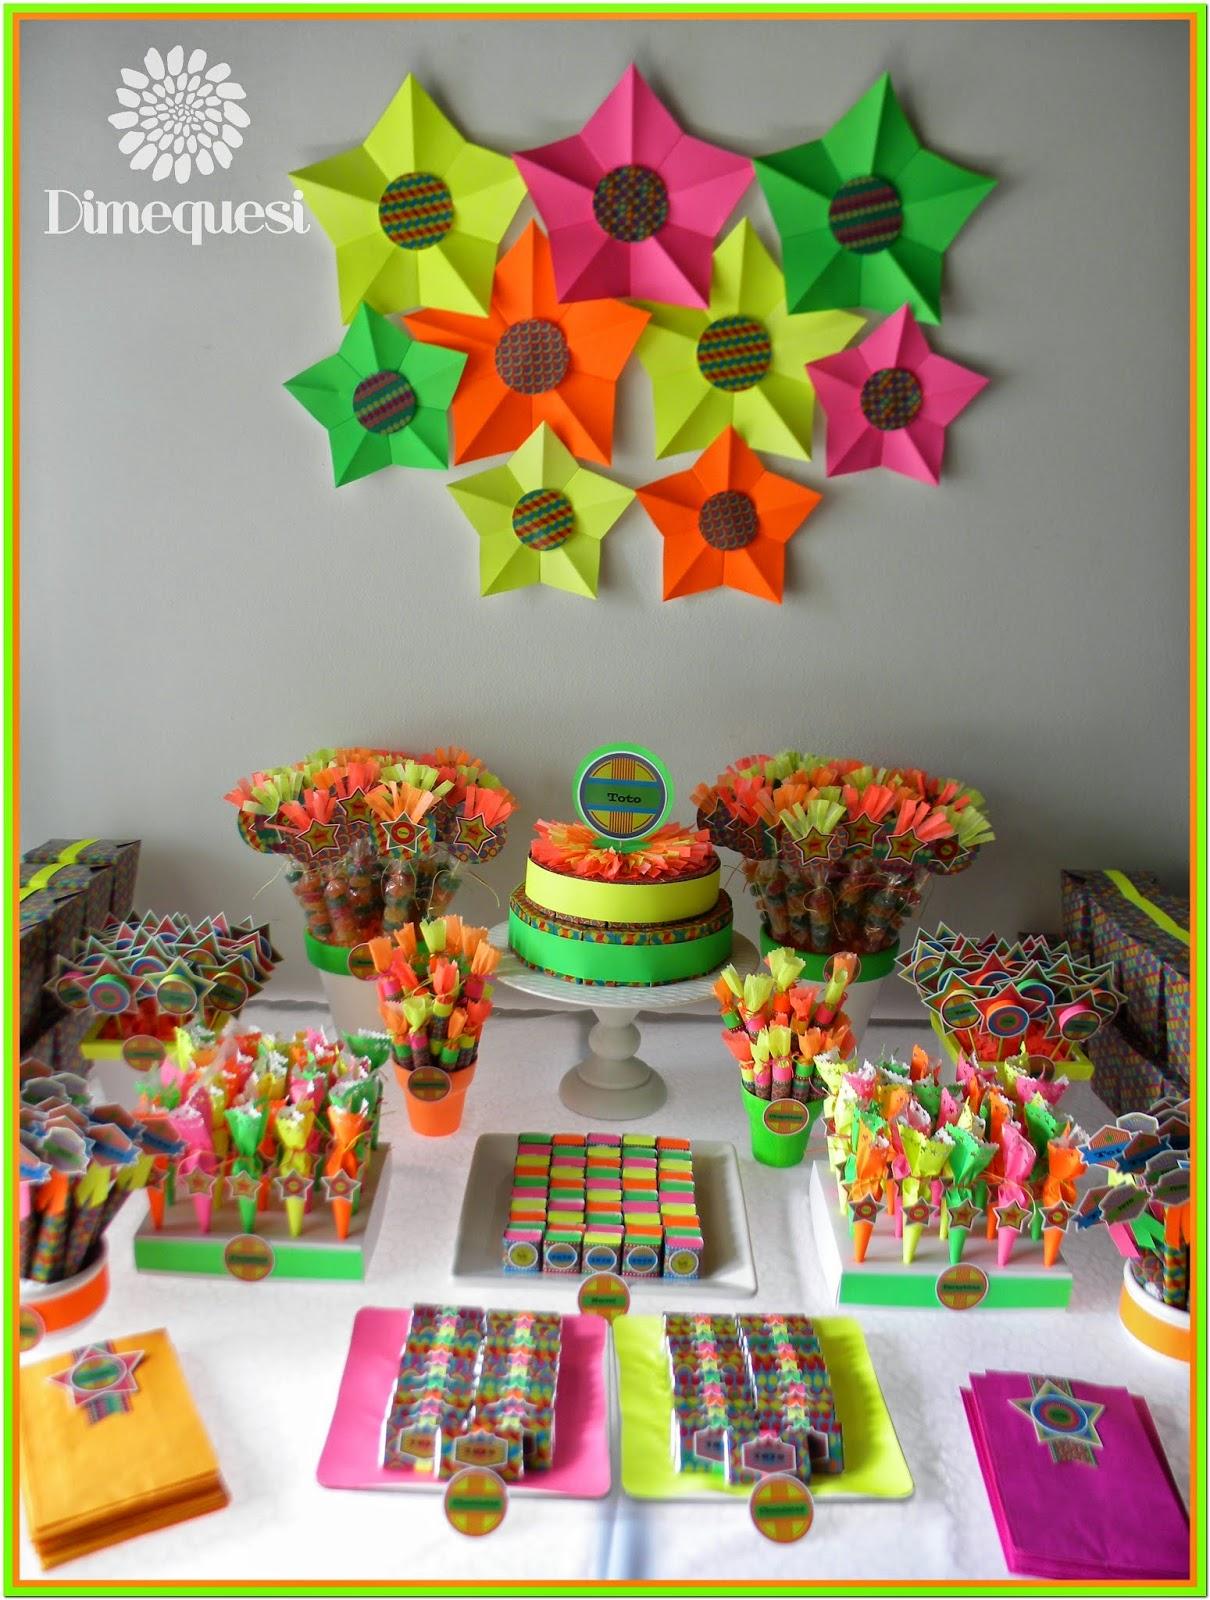 Dimequesi glow for Mesa de cumpleanos para adultos